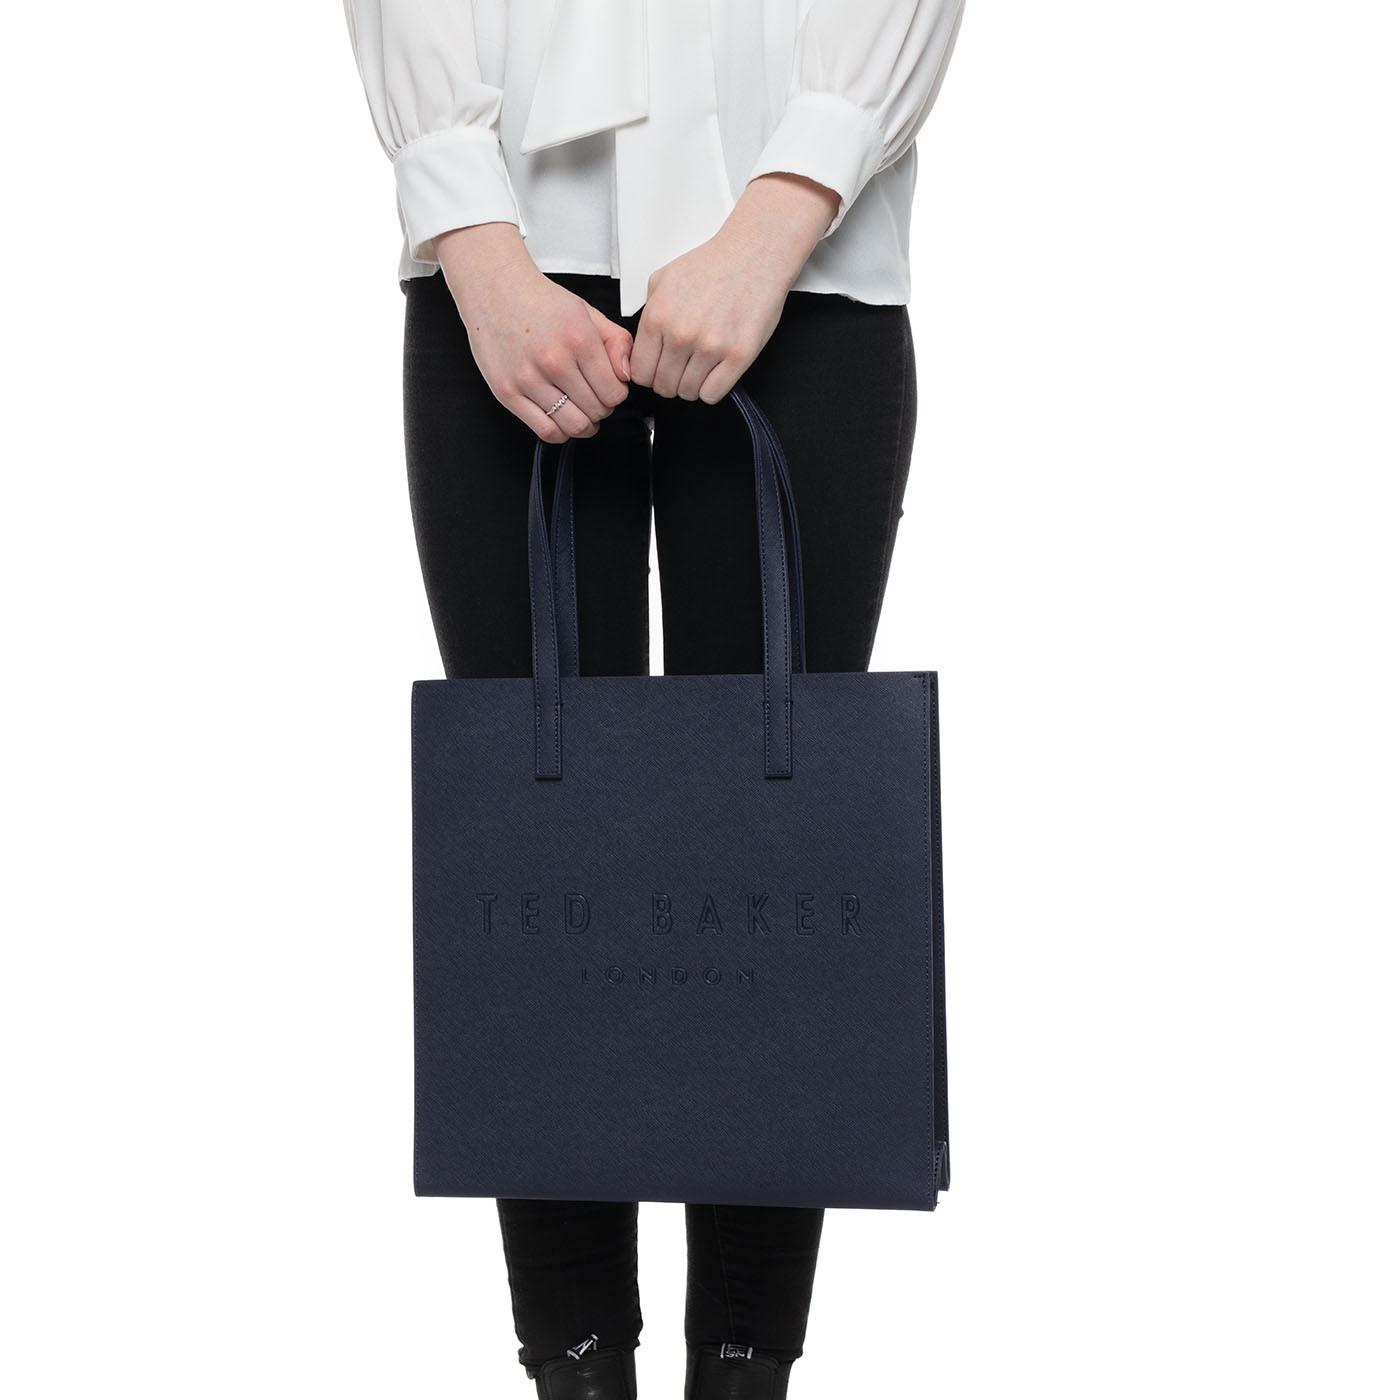 Ted Baker Soocon Dark Blue Shopper TB155930BL